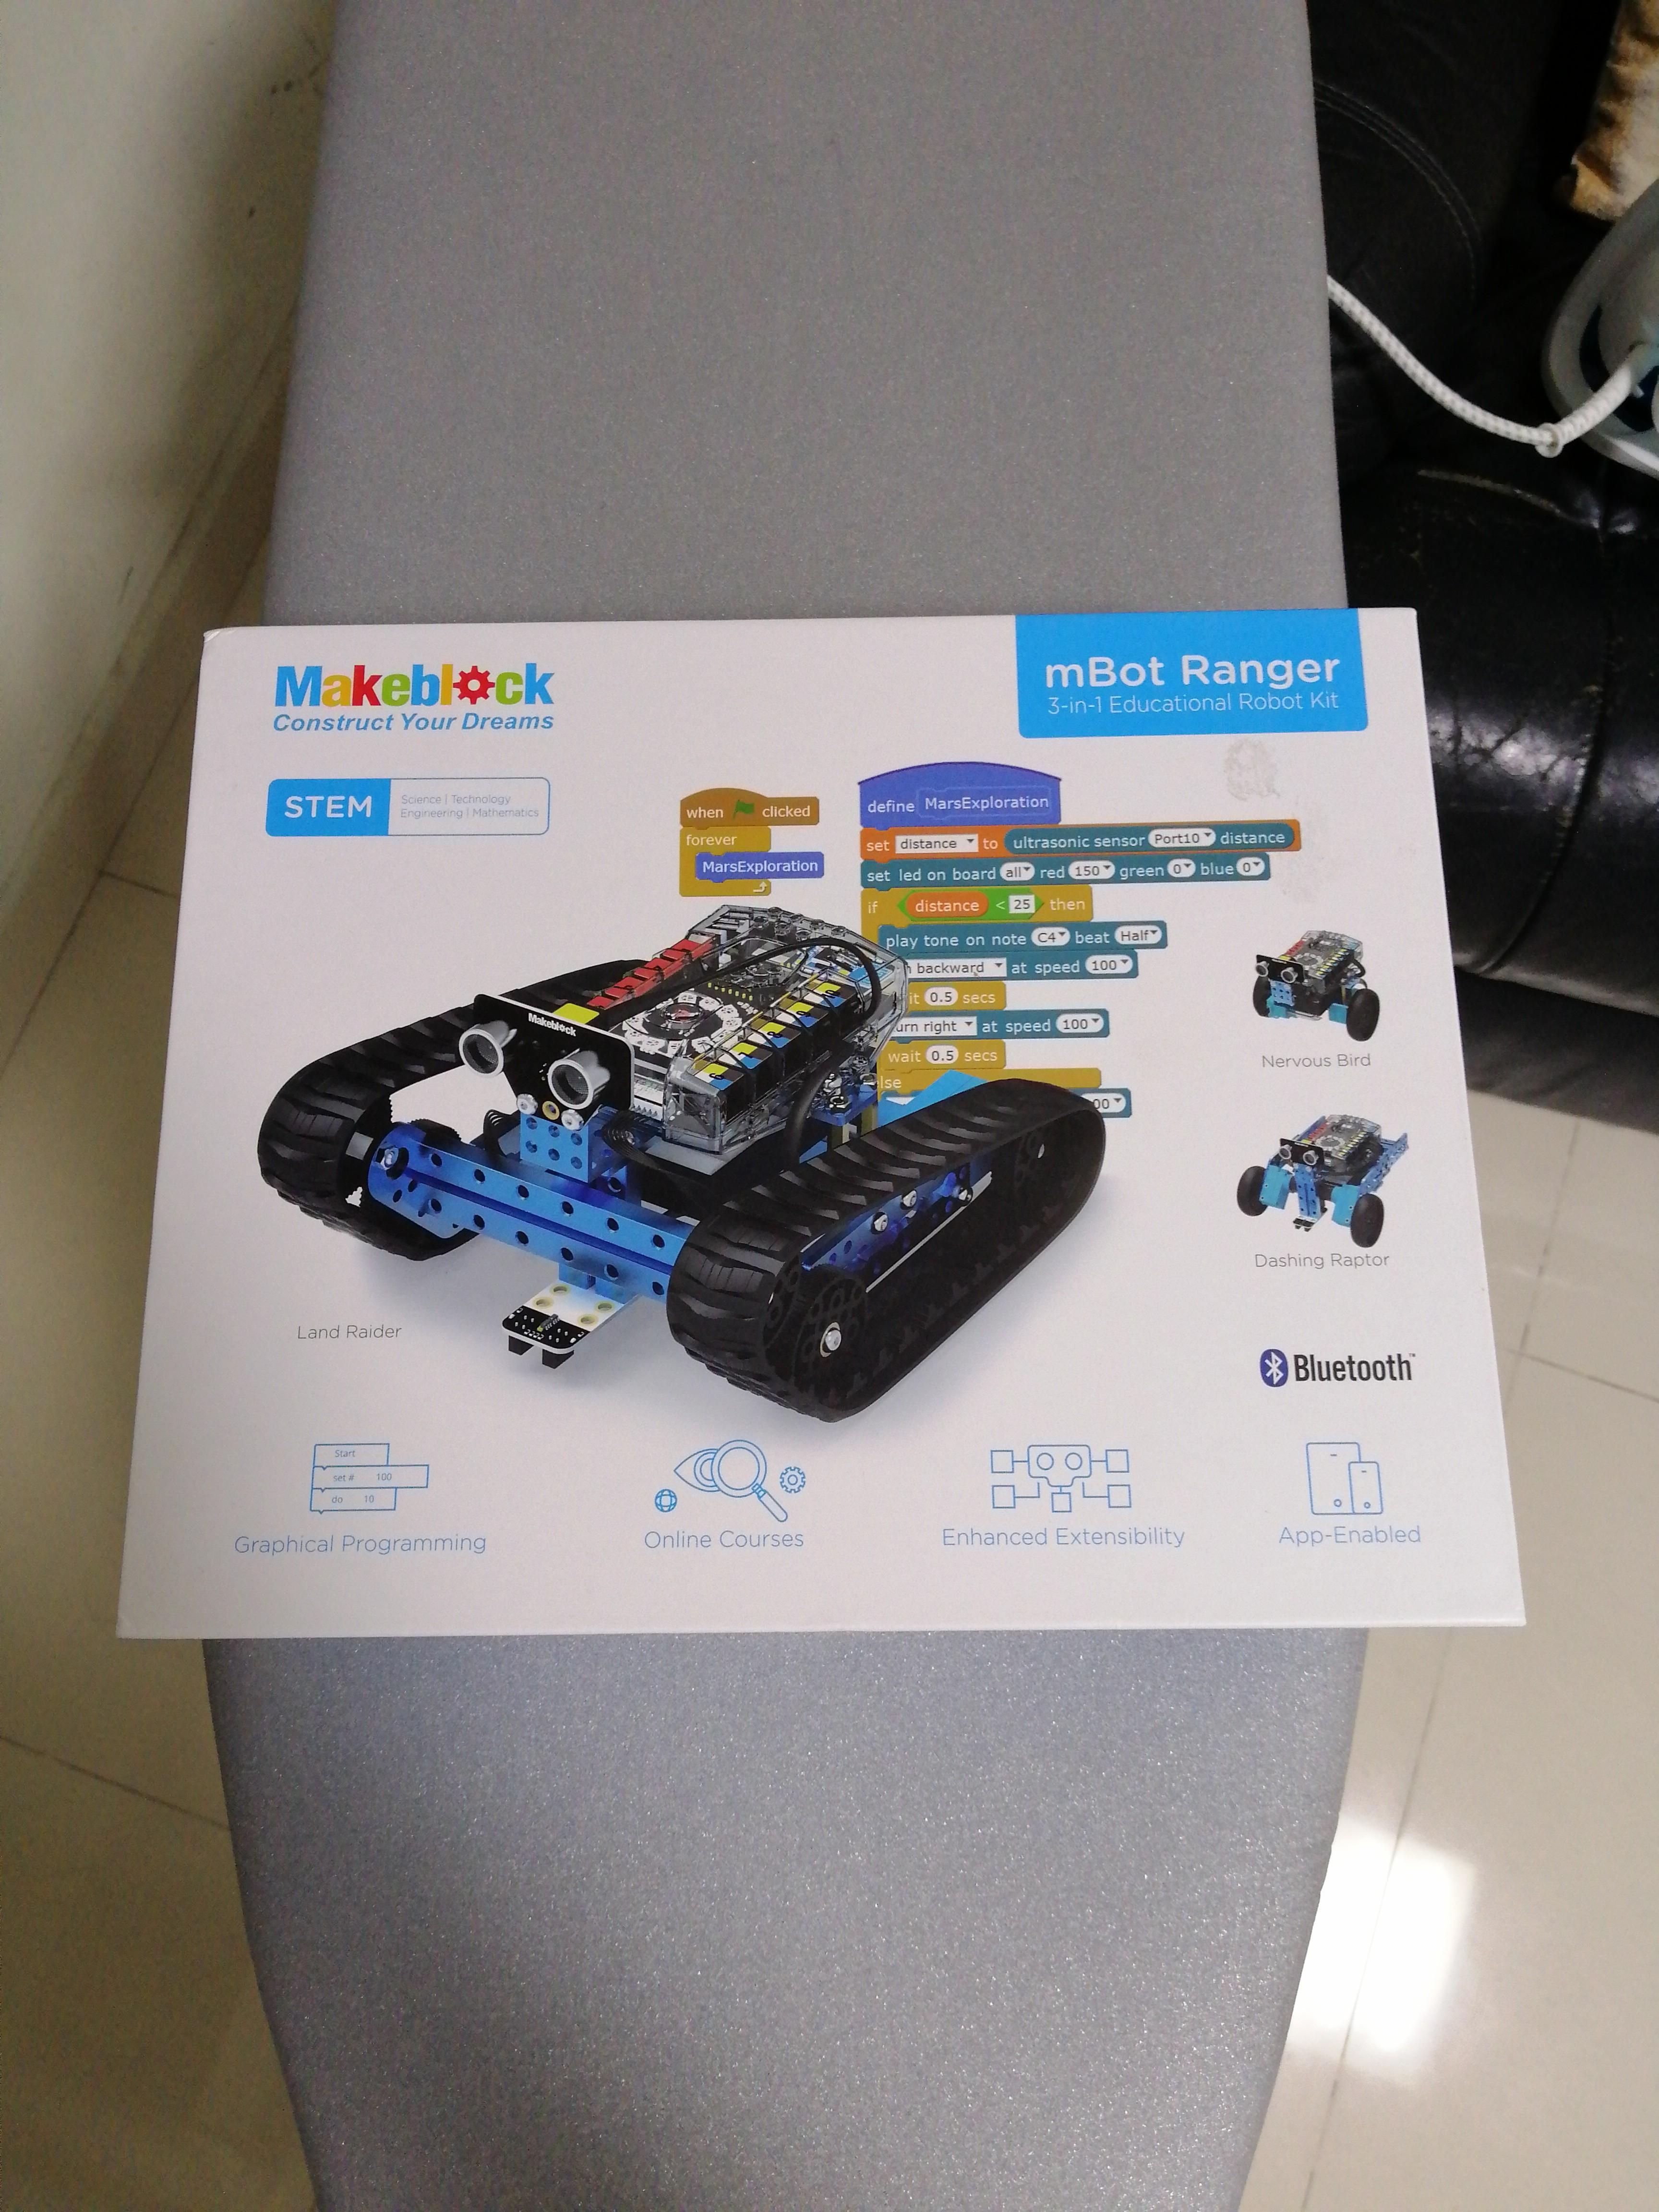 Makeblock mBot Ranger 3 in 1 Educational Robot Kit